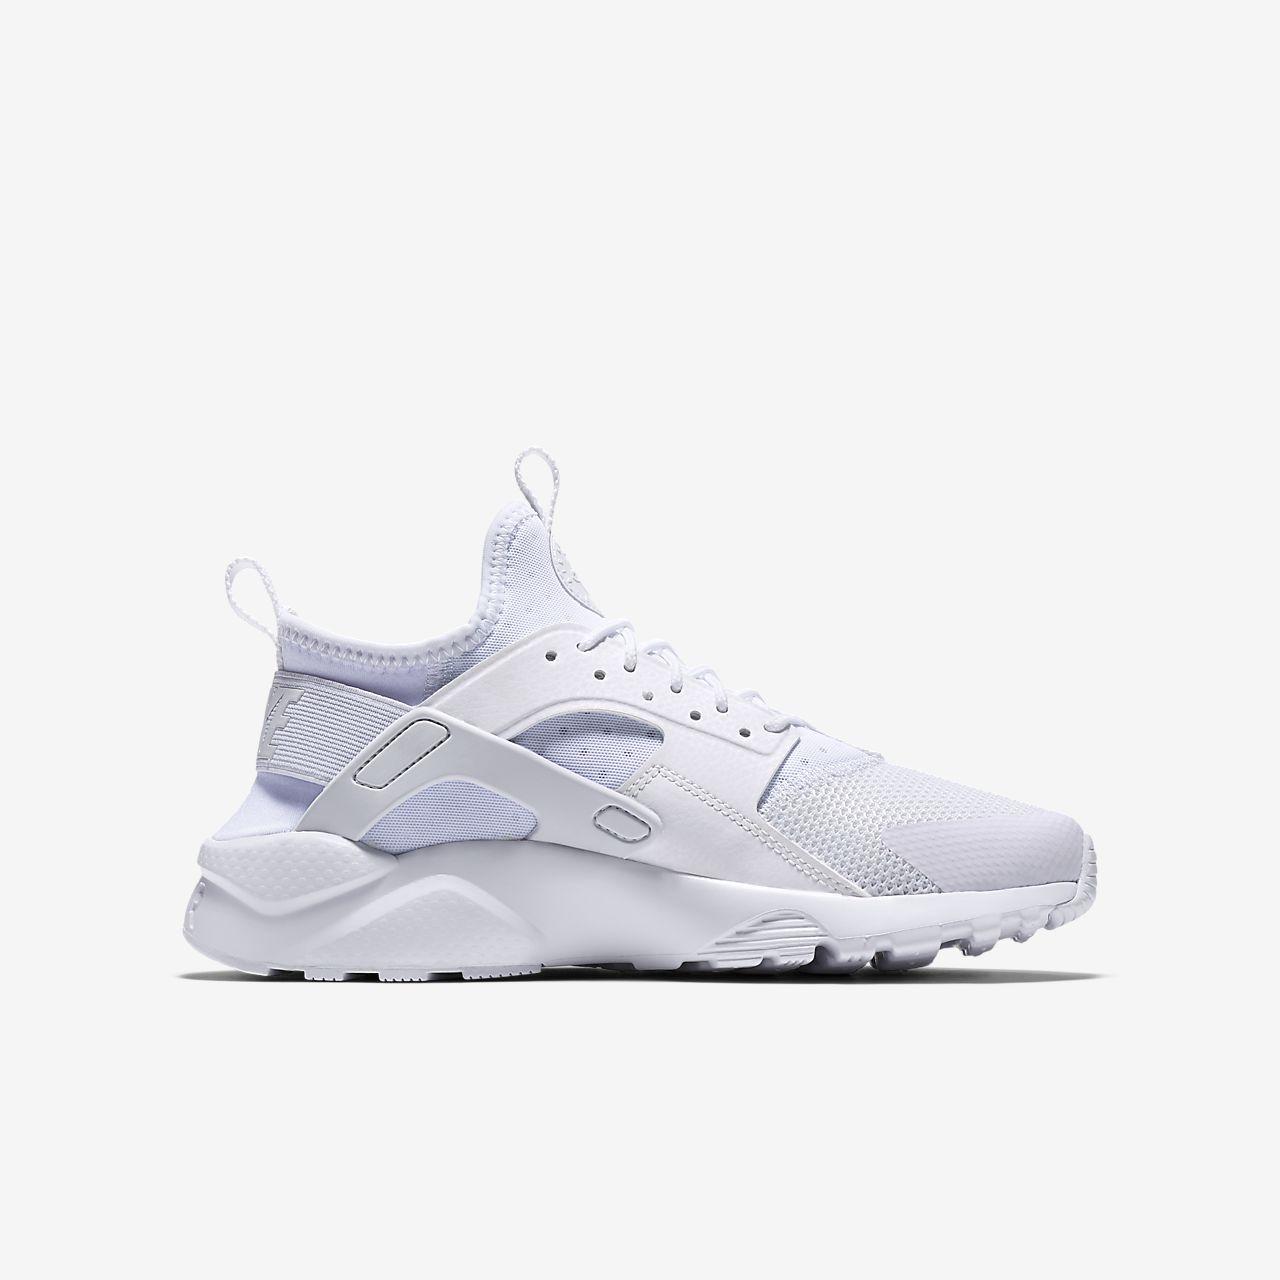 nike tights just do it pink, Nike air huarache ultra schuhe